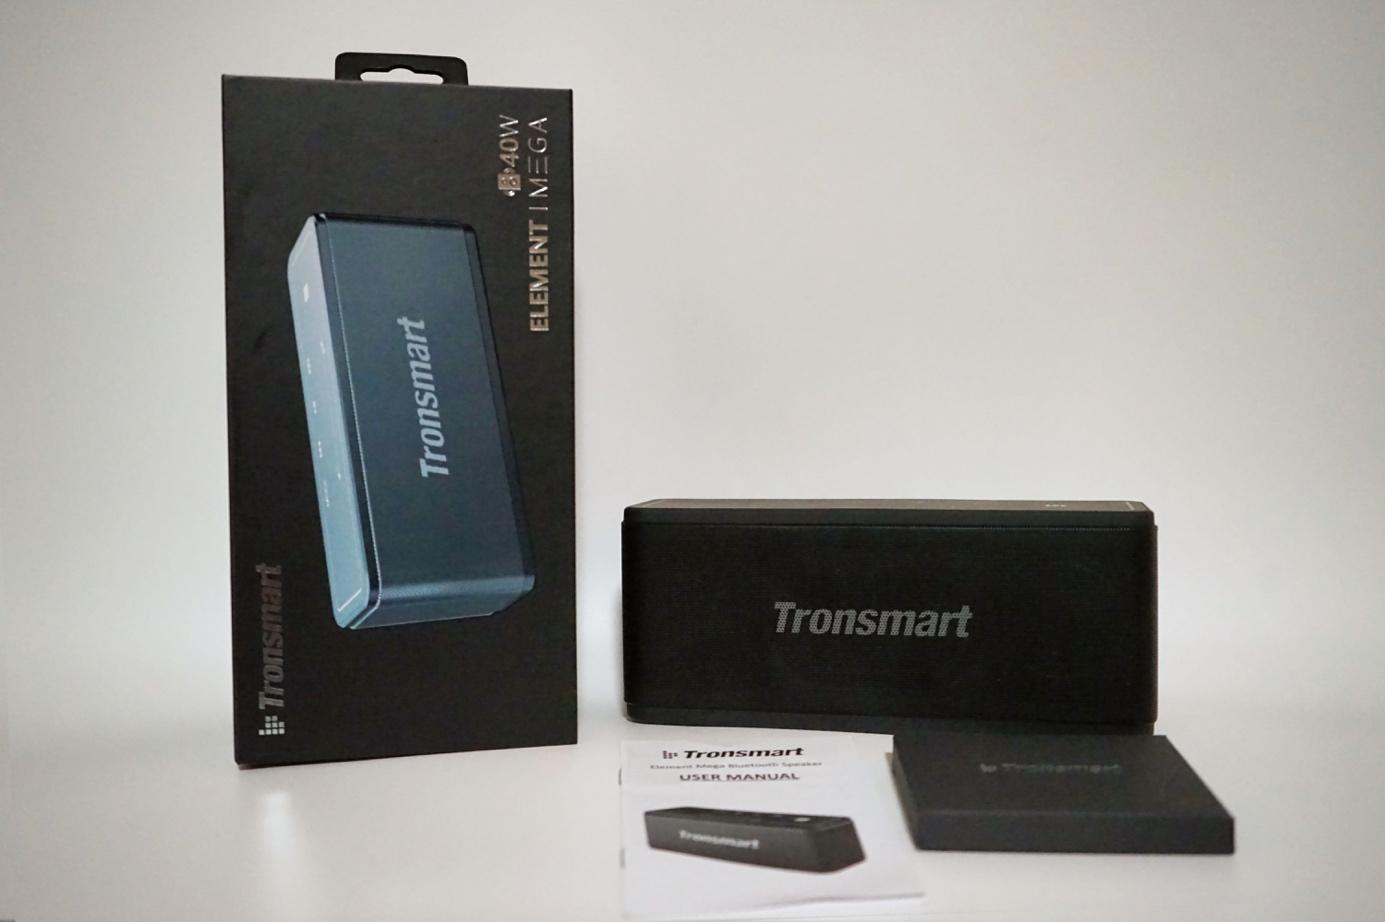 tronsmart-element-mega-40w-bluetooth-hangszoro-hordozhato-zenelejatszo-nfc-microsd-microusb-02